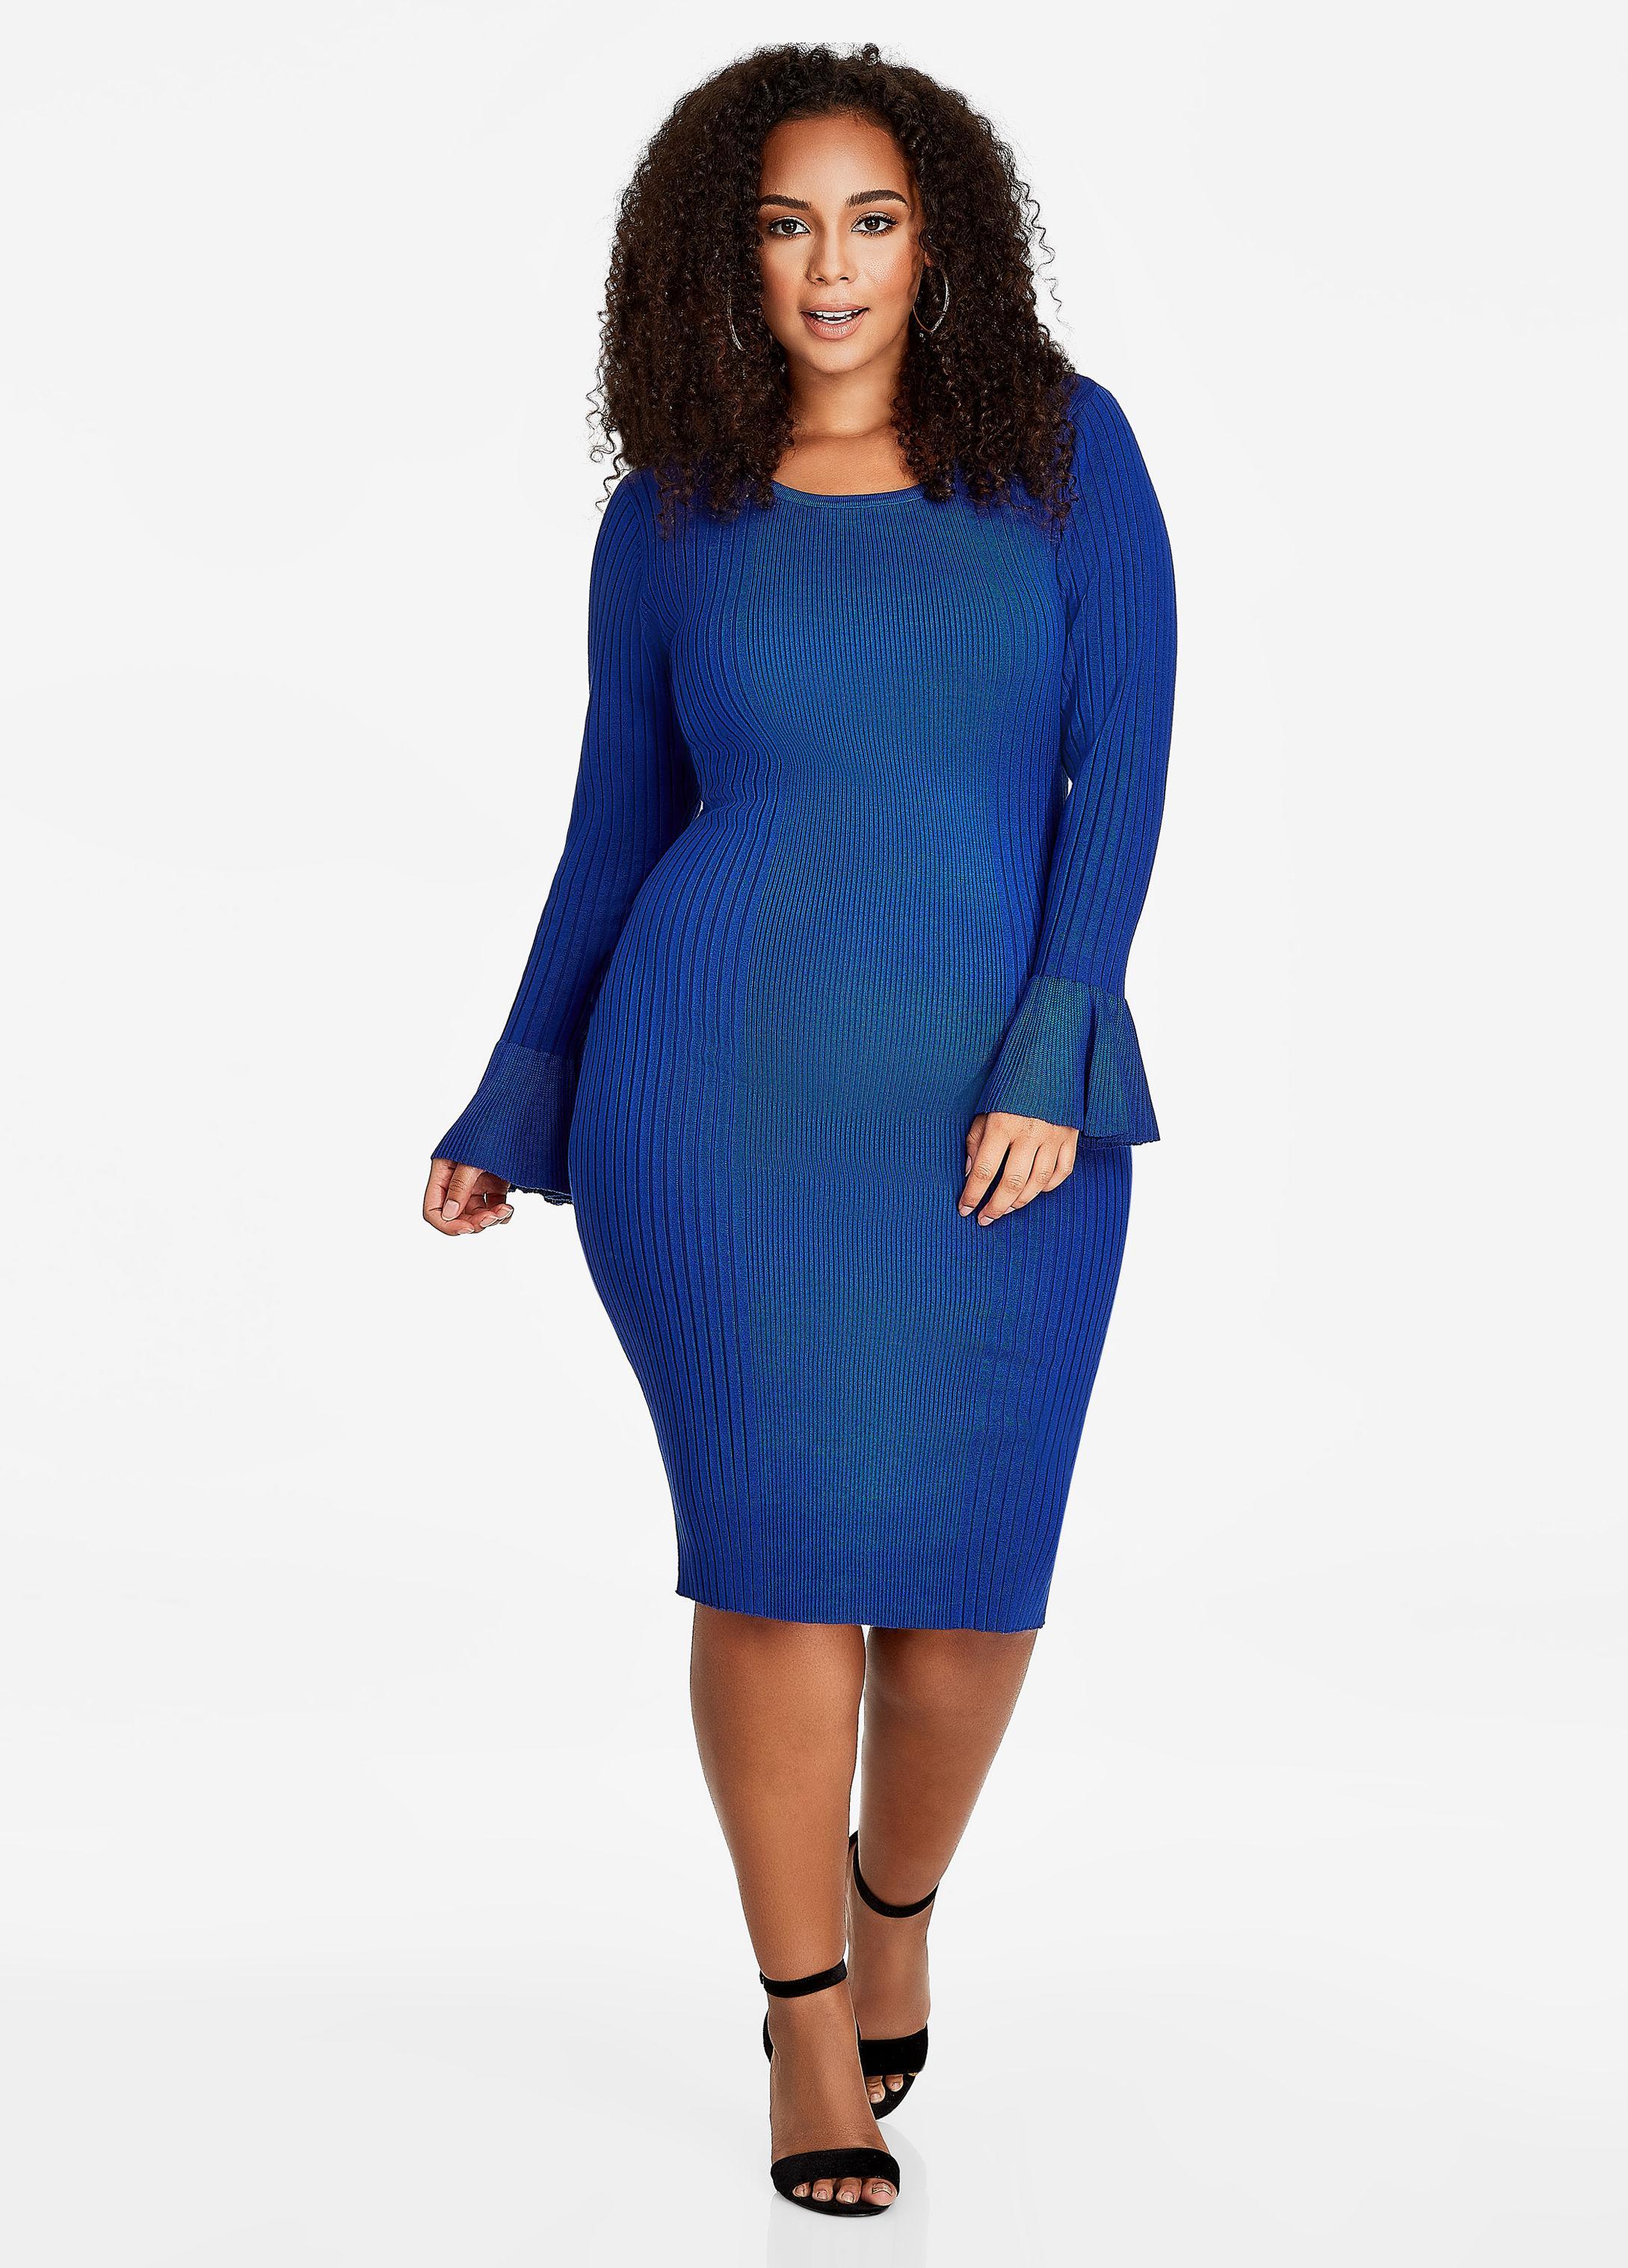 871ab17f55 Lyst - Ashley Stewart Ruffle Sleeve Ribbed Sweater Dress in Blue